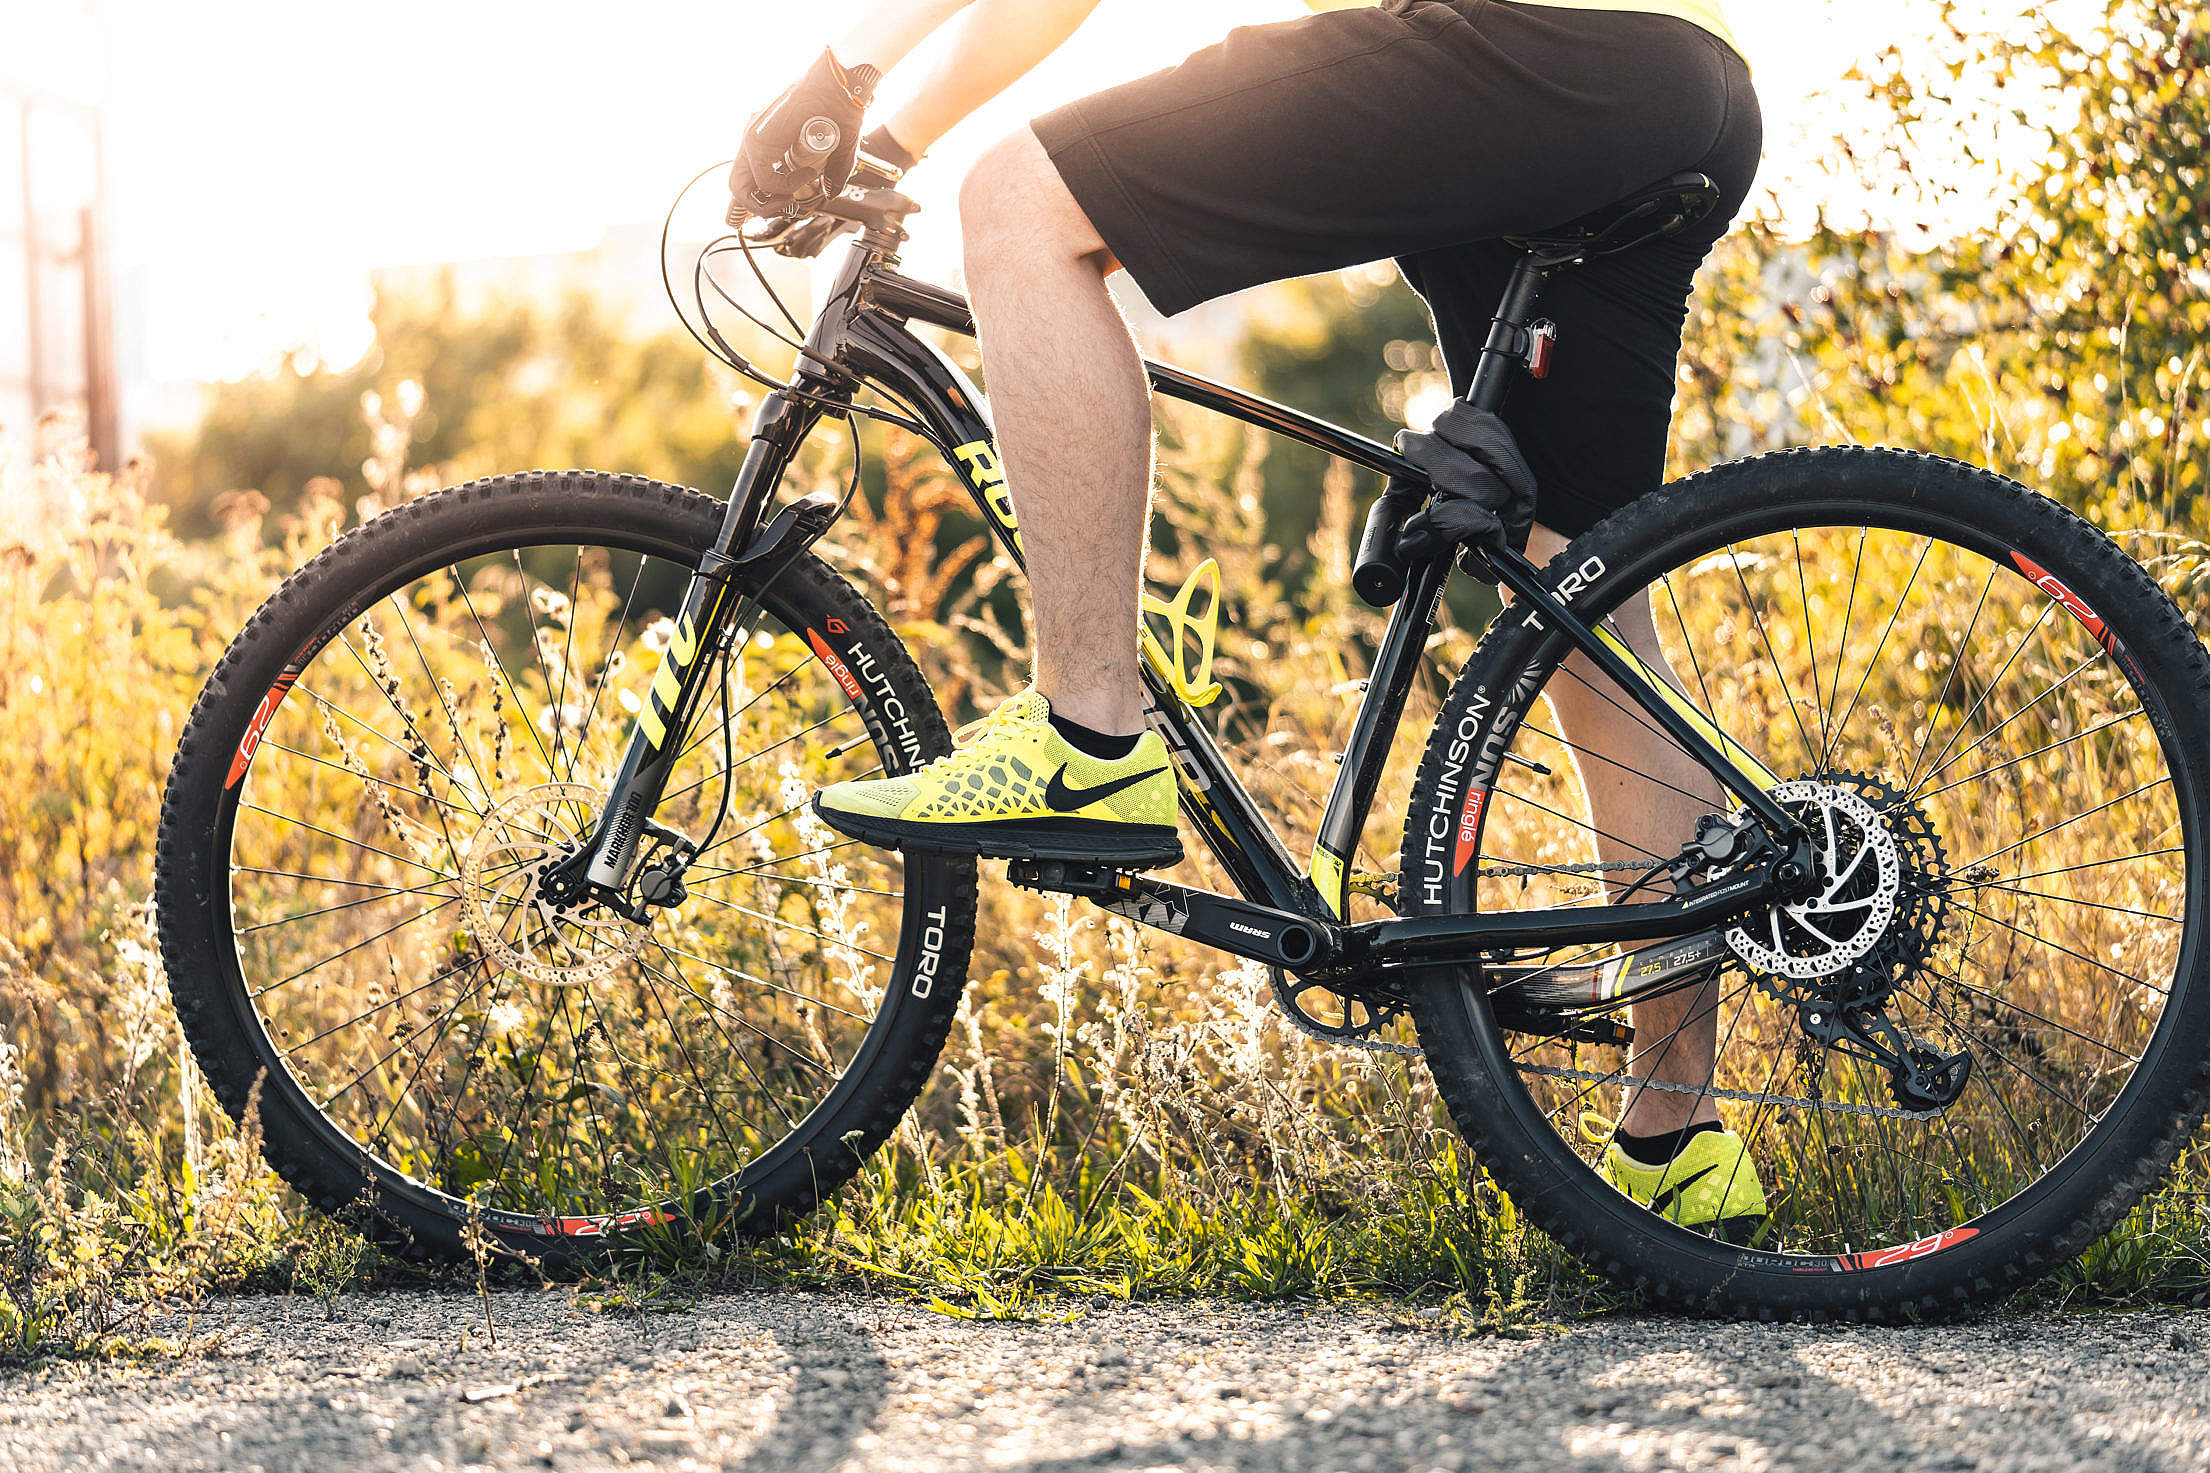 Man Sitting on a Mountain Bike Free Stock Photo